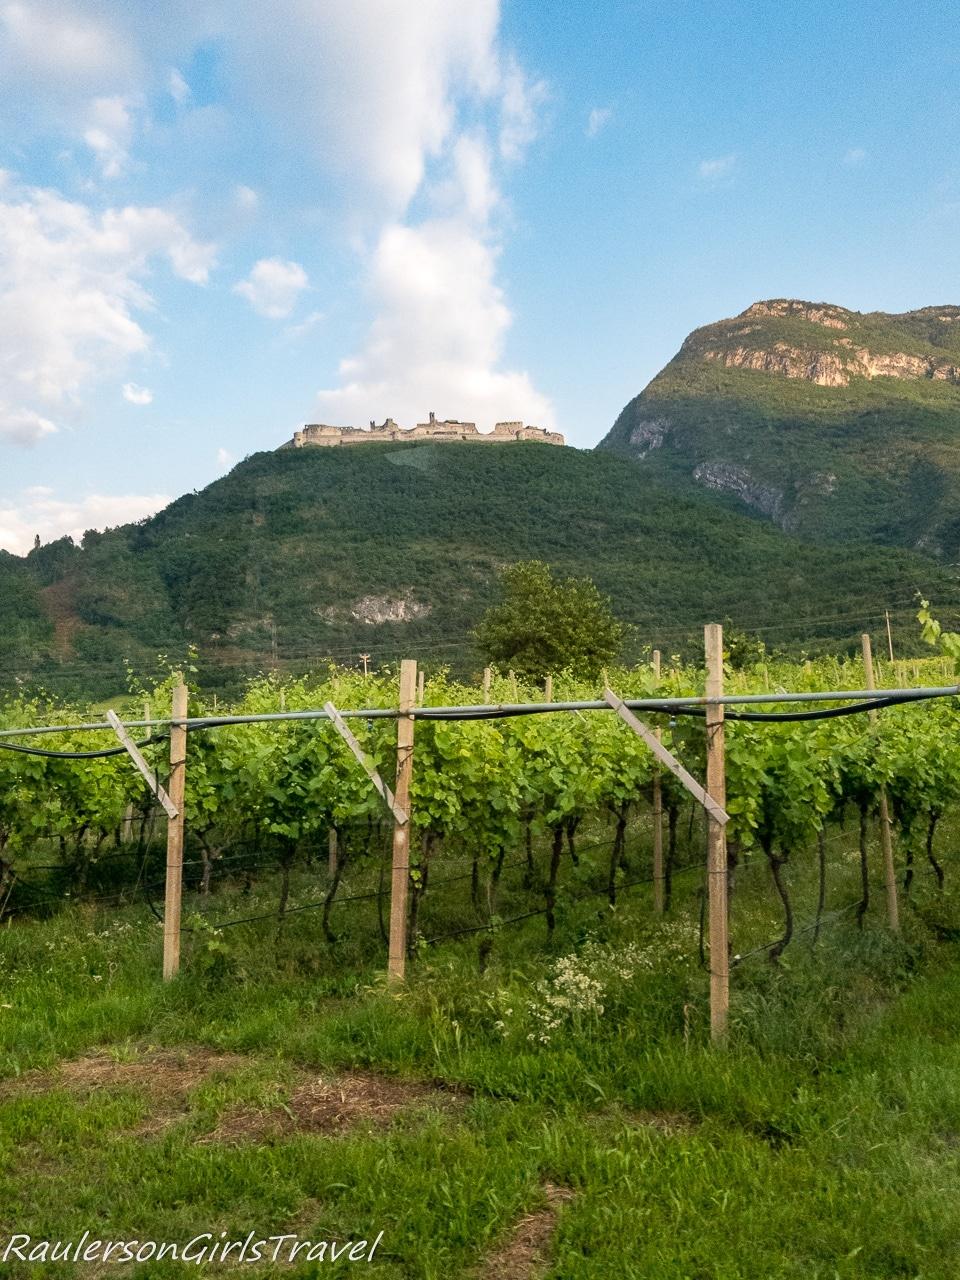 Vineyards in Trento